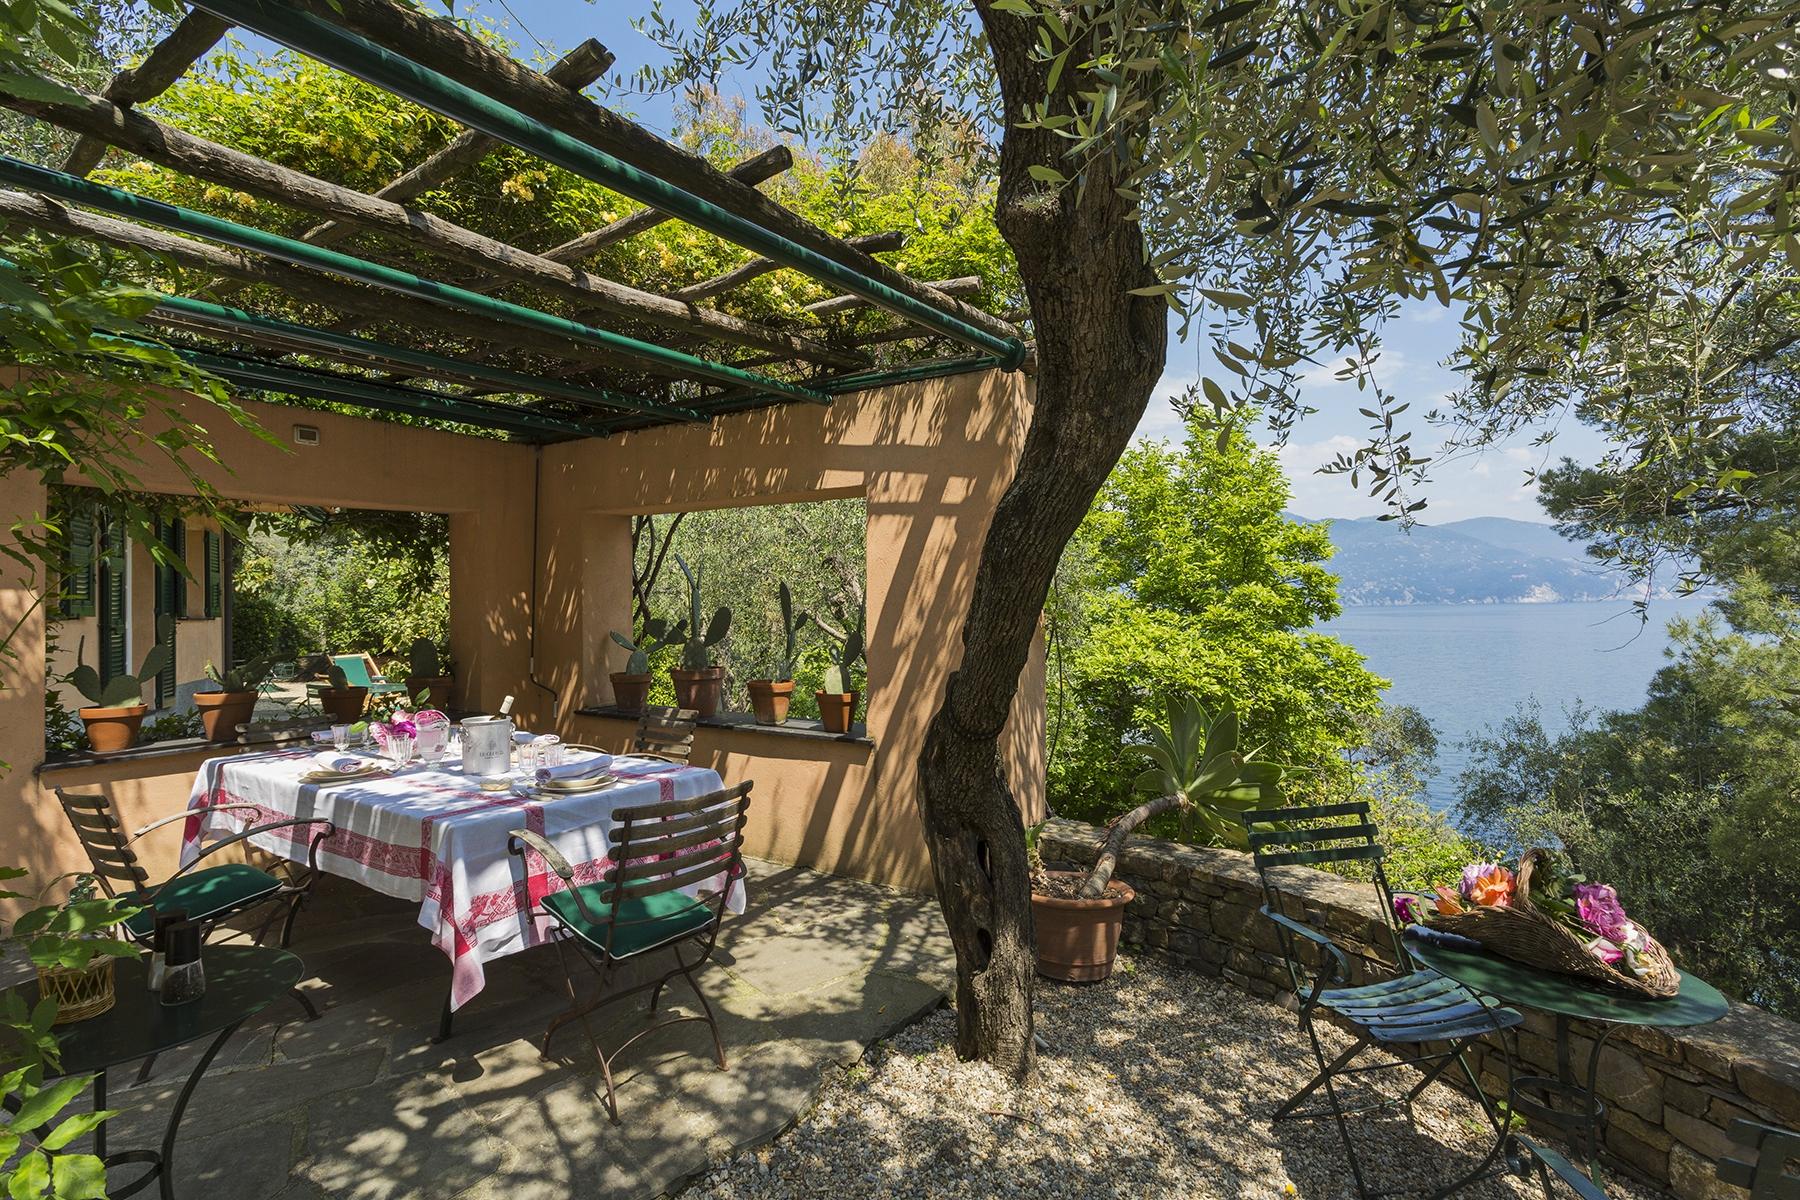 Villa in Vendita a Santa Margherita Ligure: 5 locali, 580 mq - Foto 6